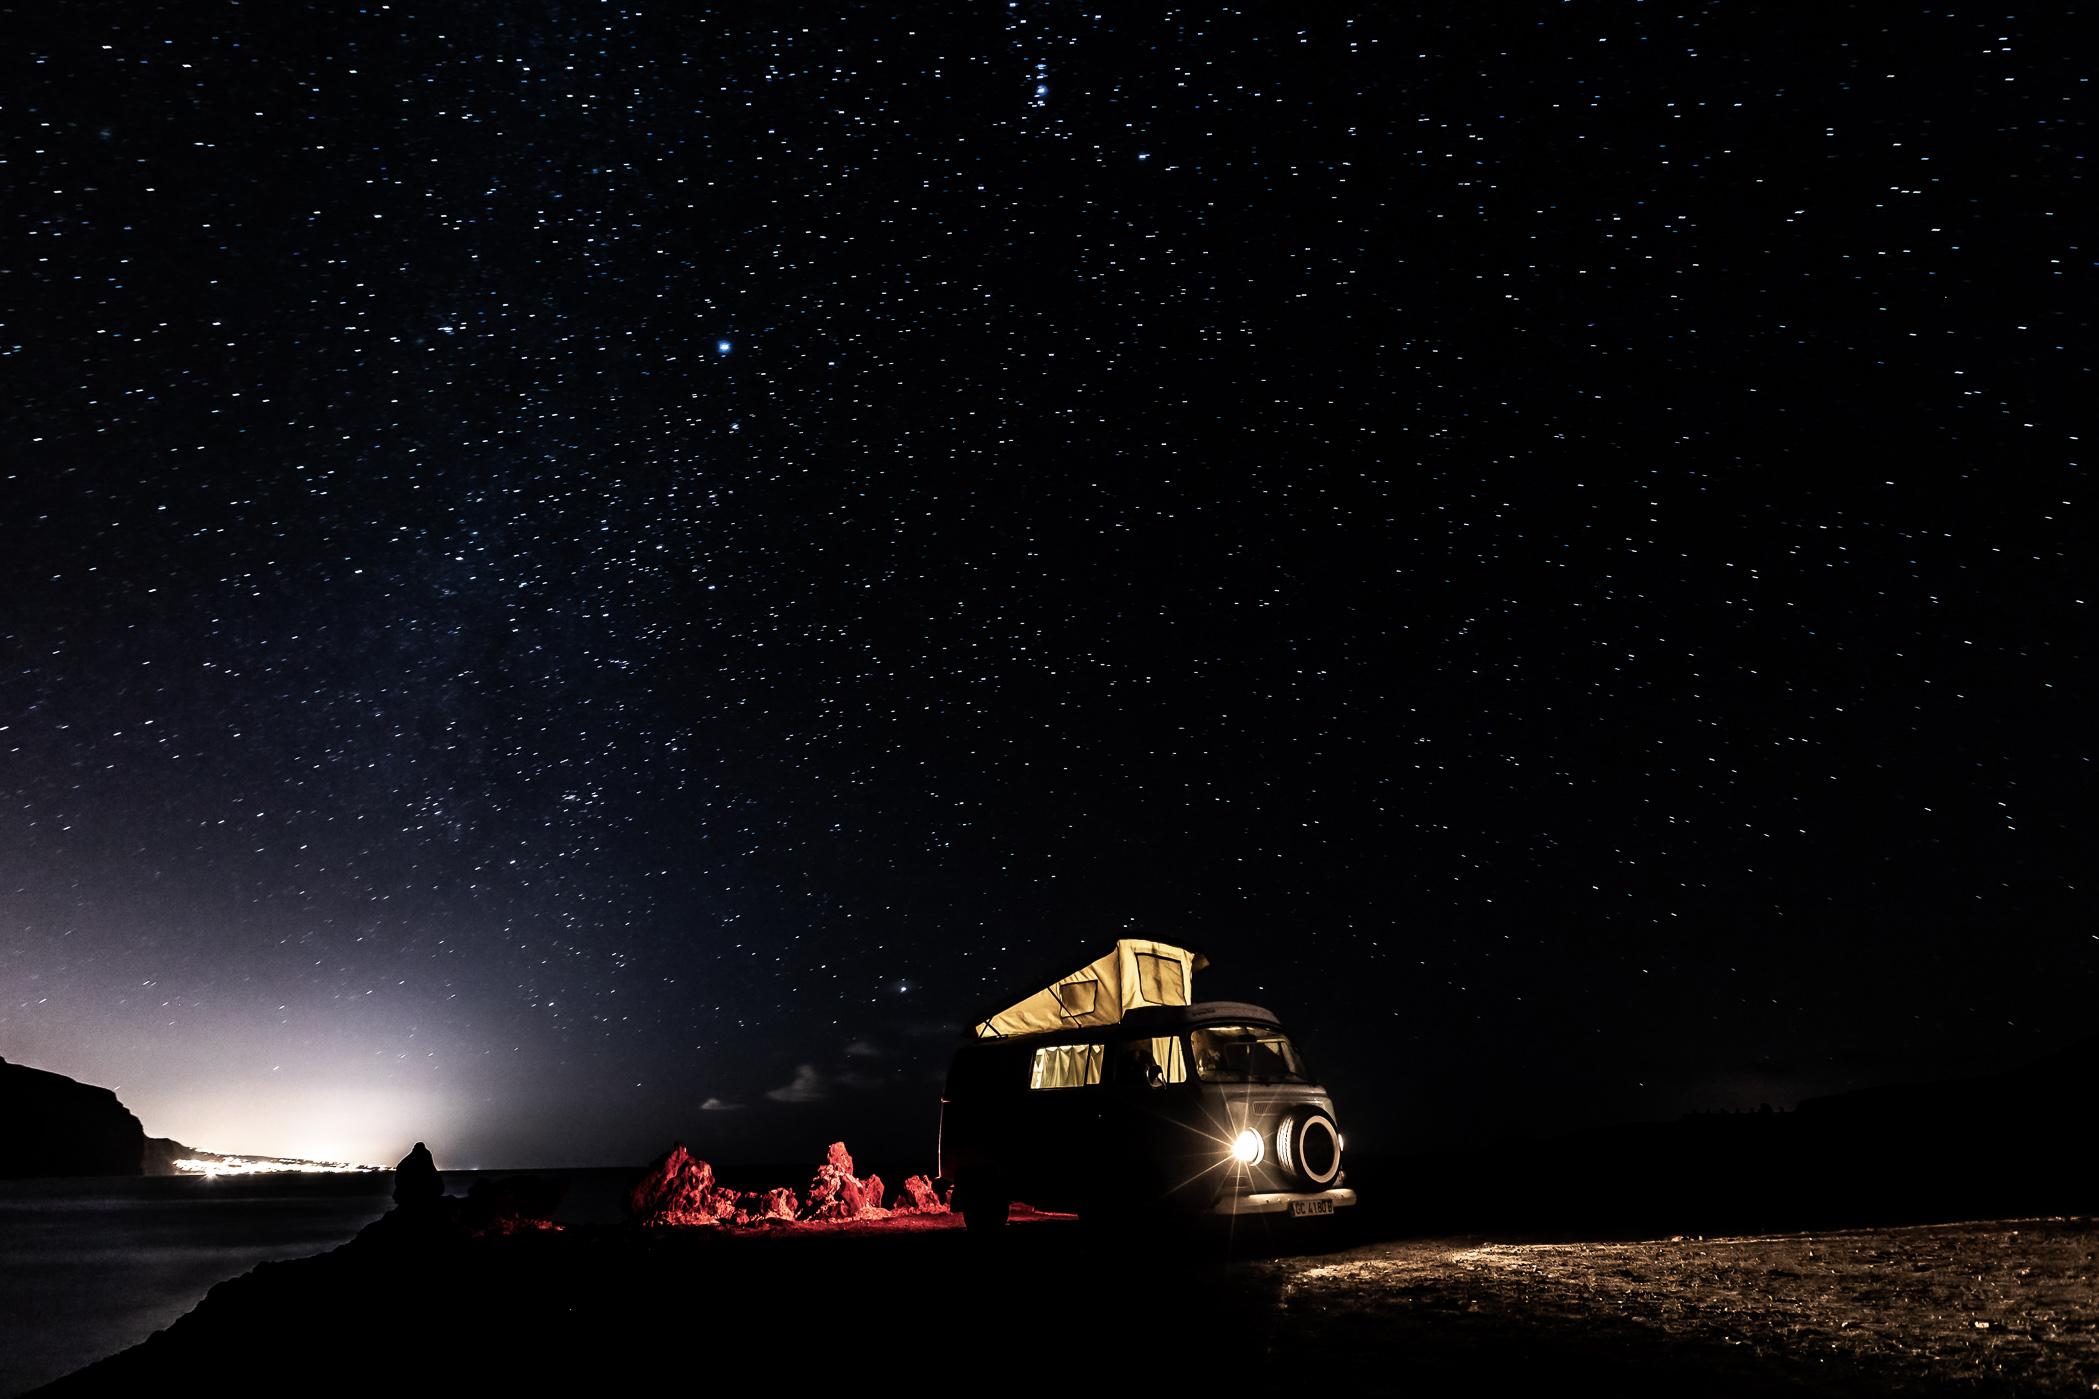 Bulli, Vintage van, Vanlife, VW T2a, Camping, Florian Kresse, Photography, Stars, Milkyway, Sternenhimmel, Fotografie, Lifestyle